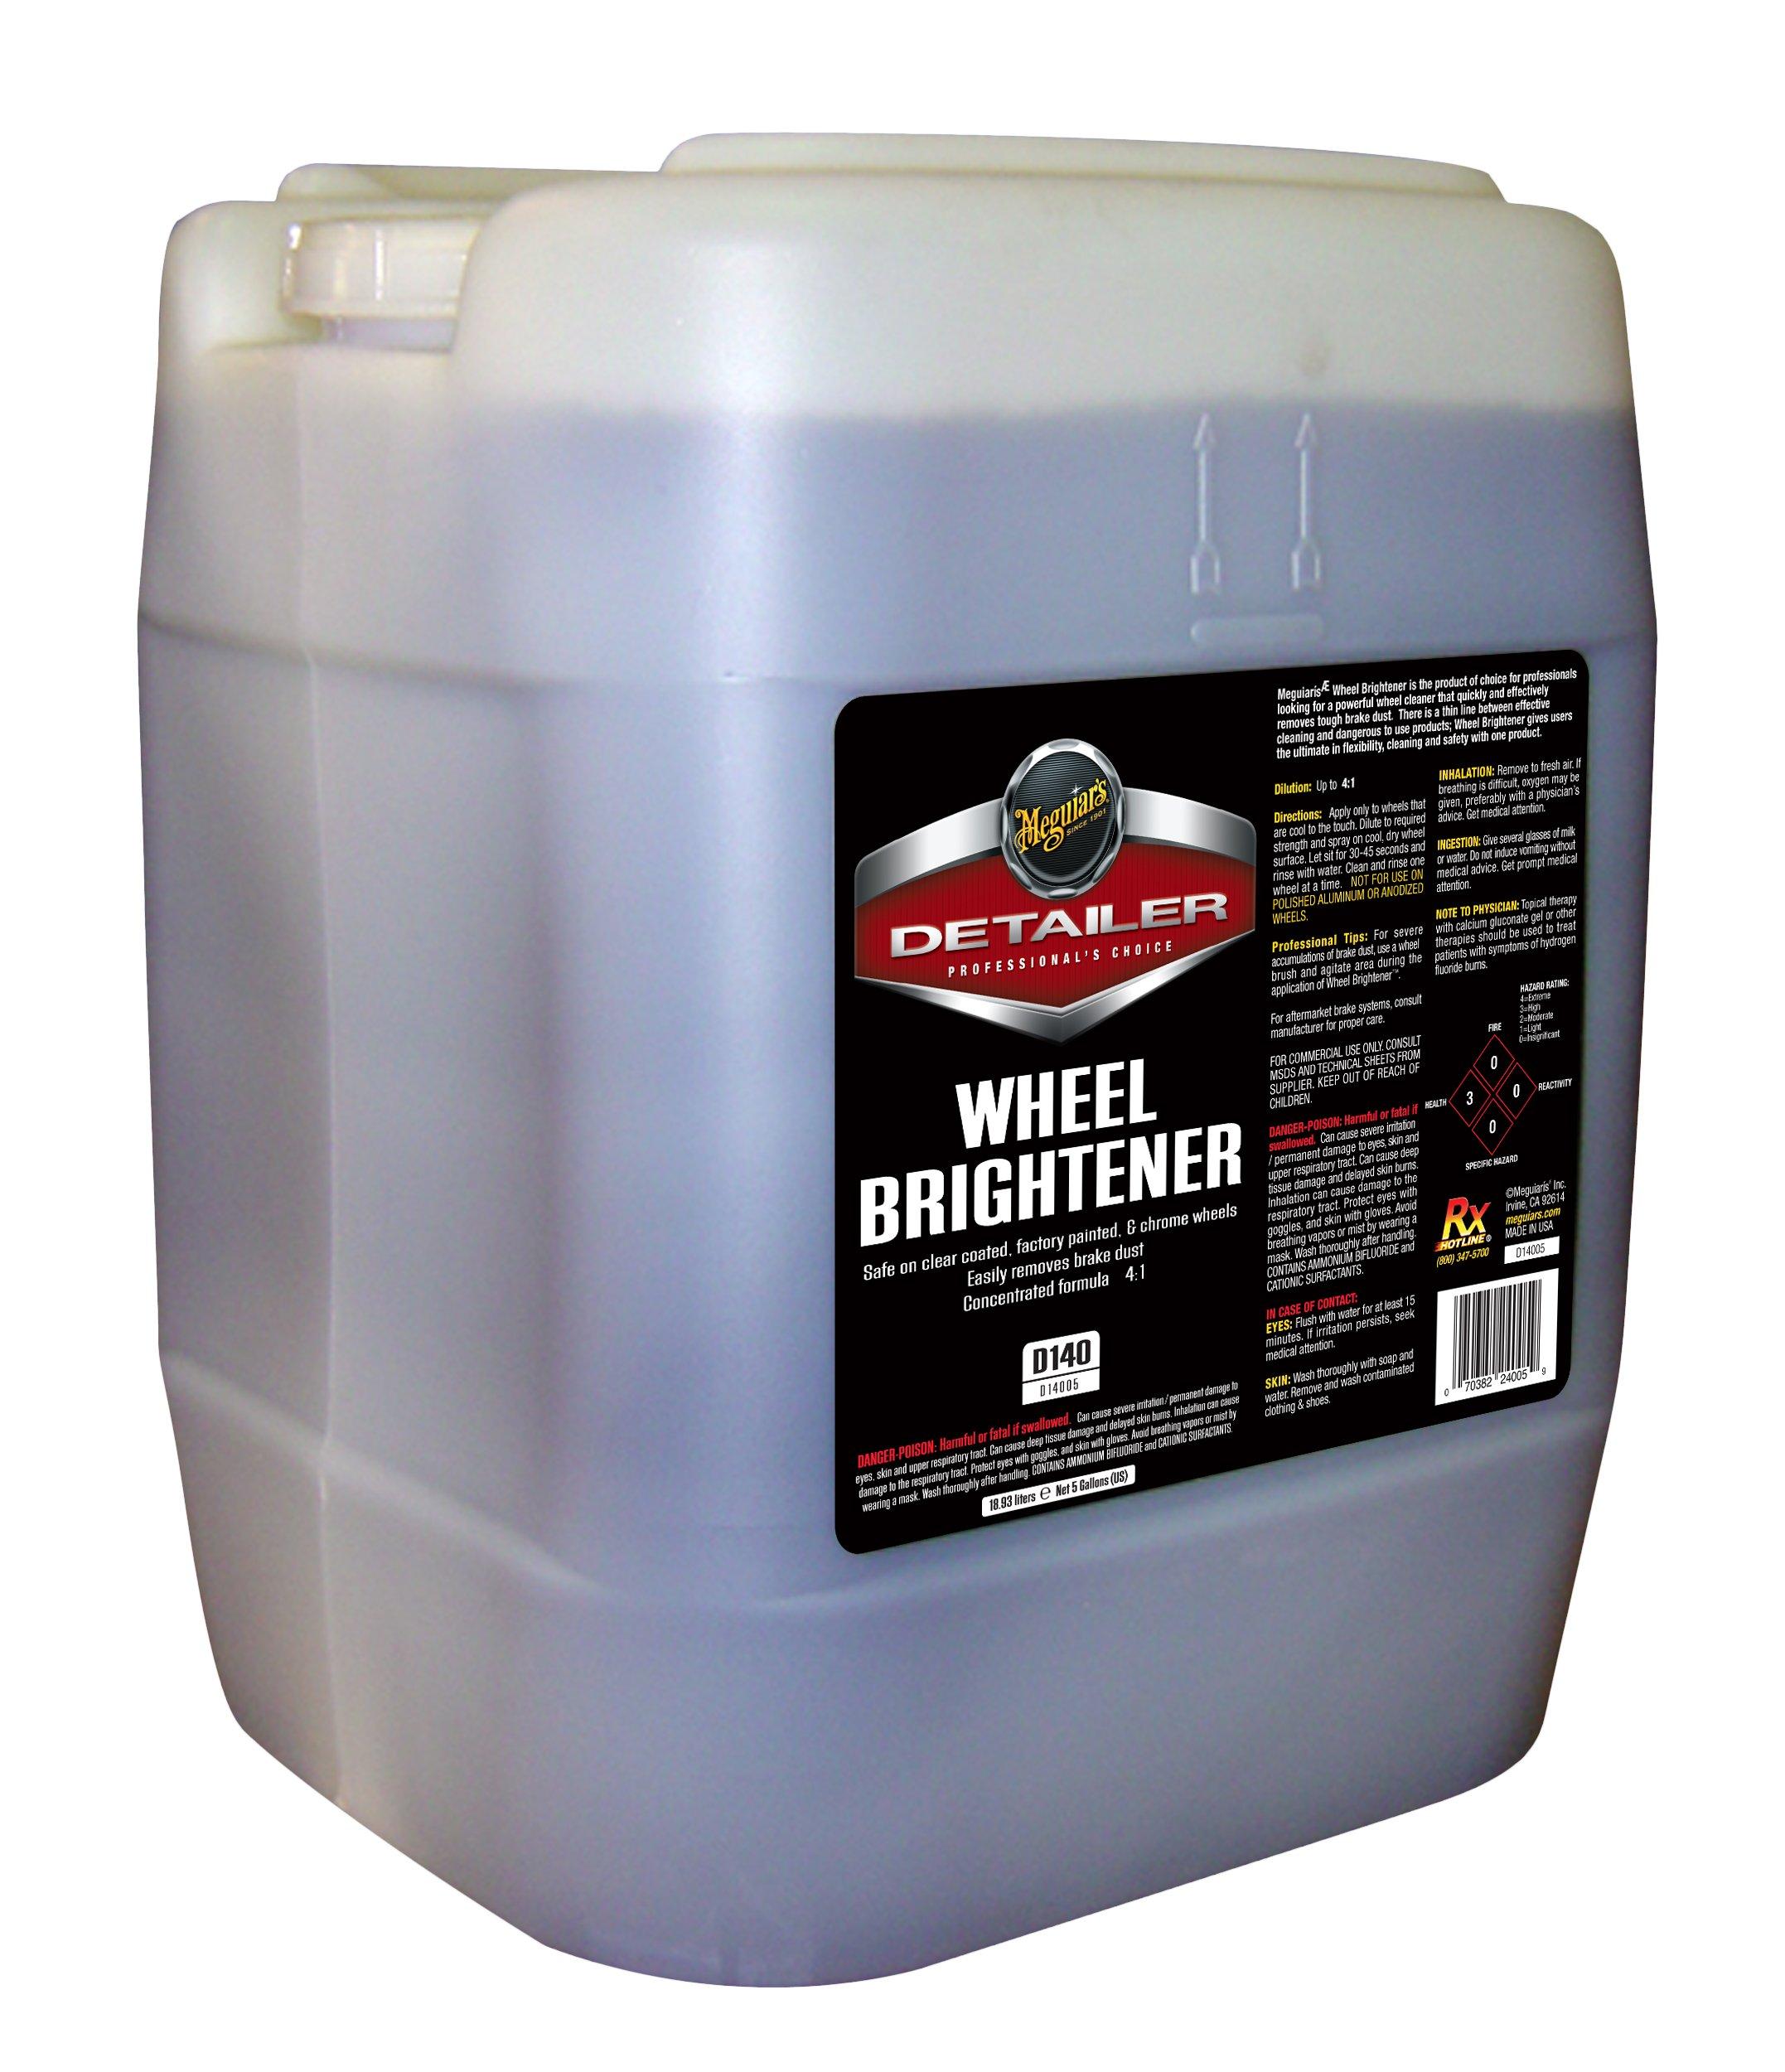 Meguiar's D14005 Wheel Brightener - 5 Gallon